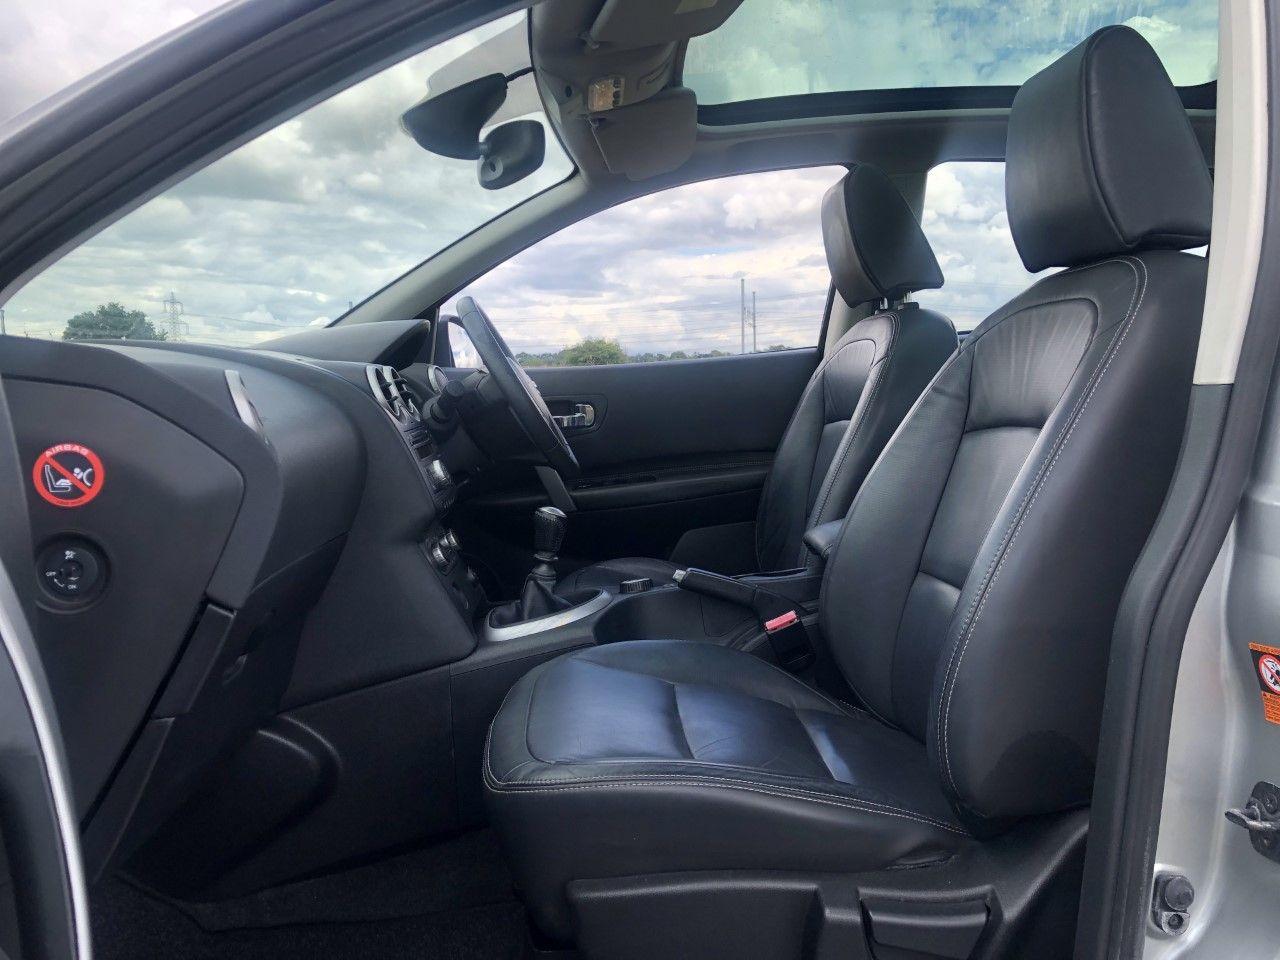 2008 Nissan Qashqai Tekna DCI 4WD £3,500